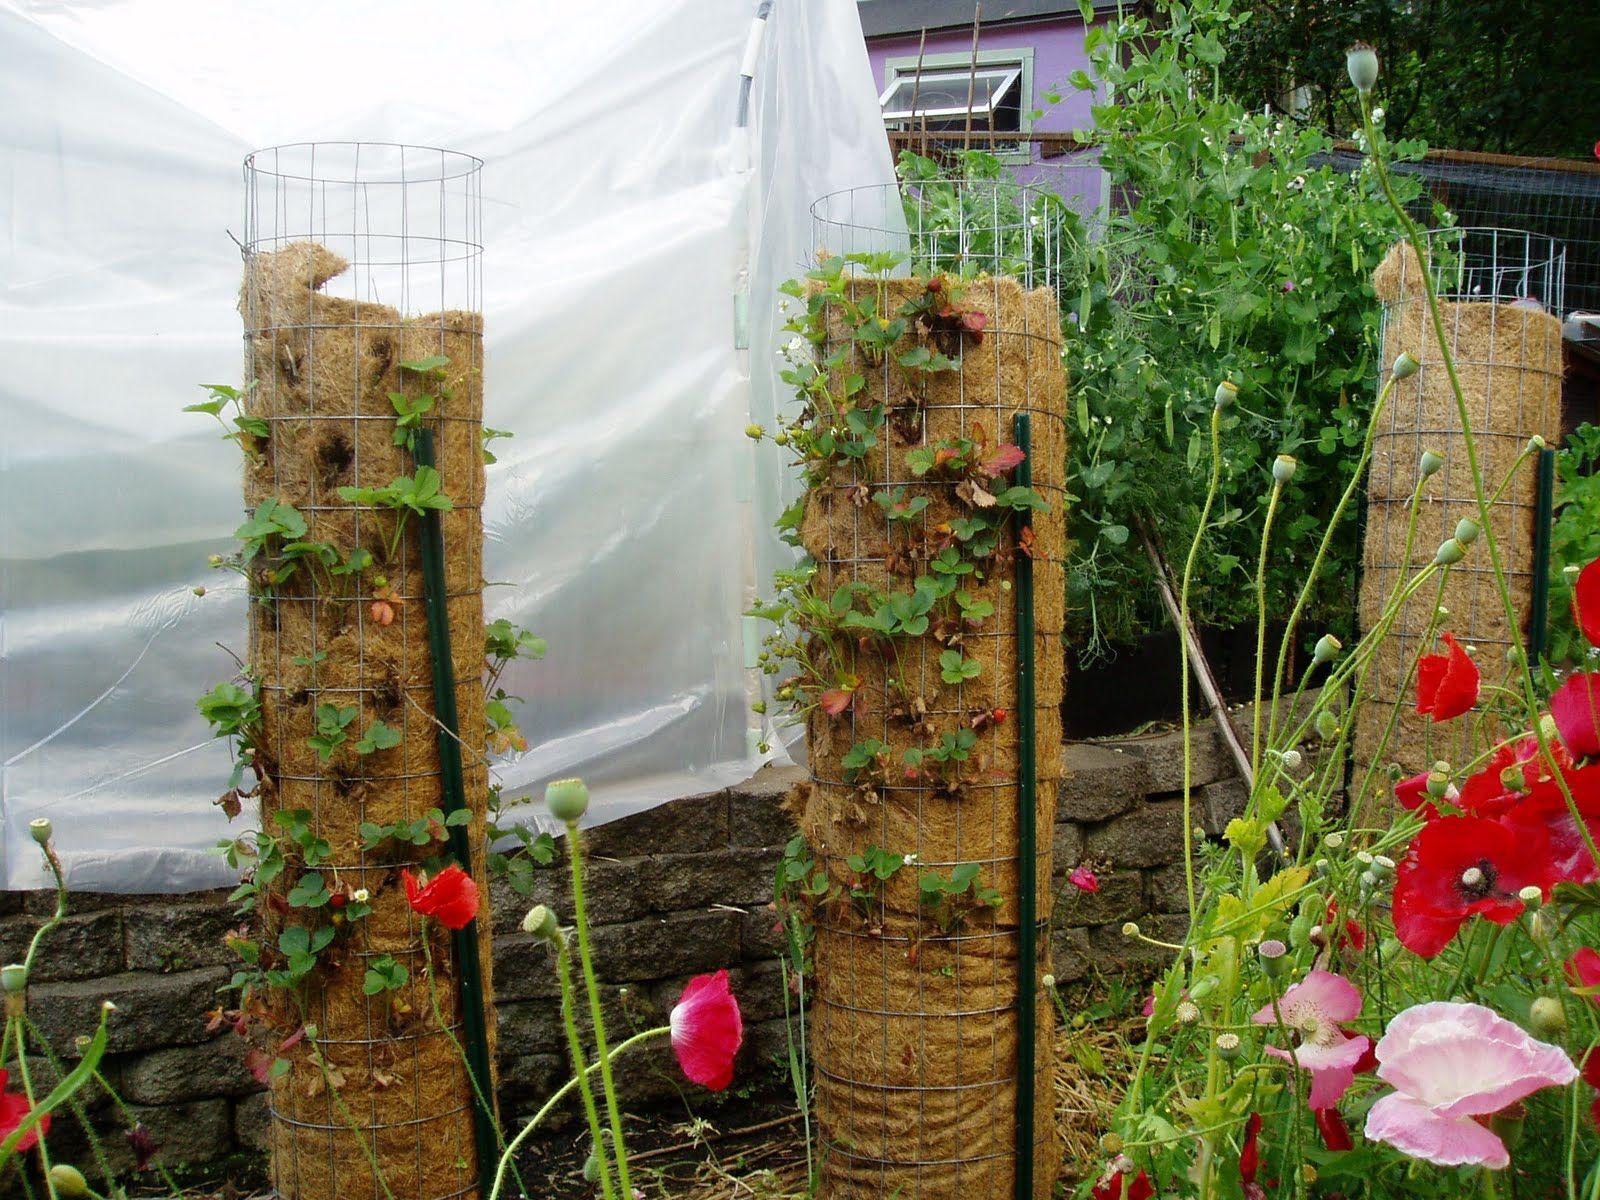 DIY strawberry towers | Garden fruit | Pinterest | Strawberry tower ...